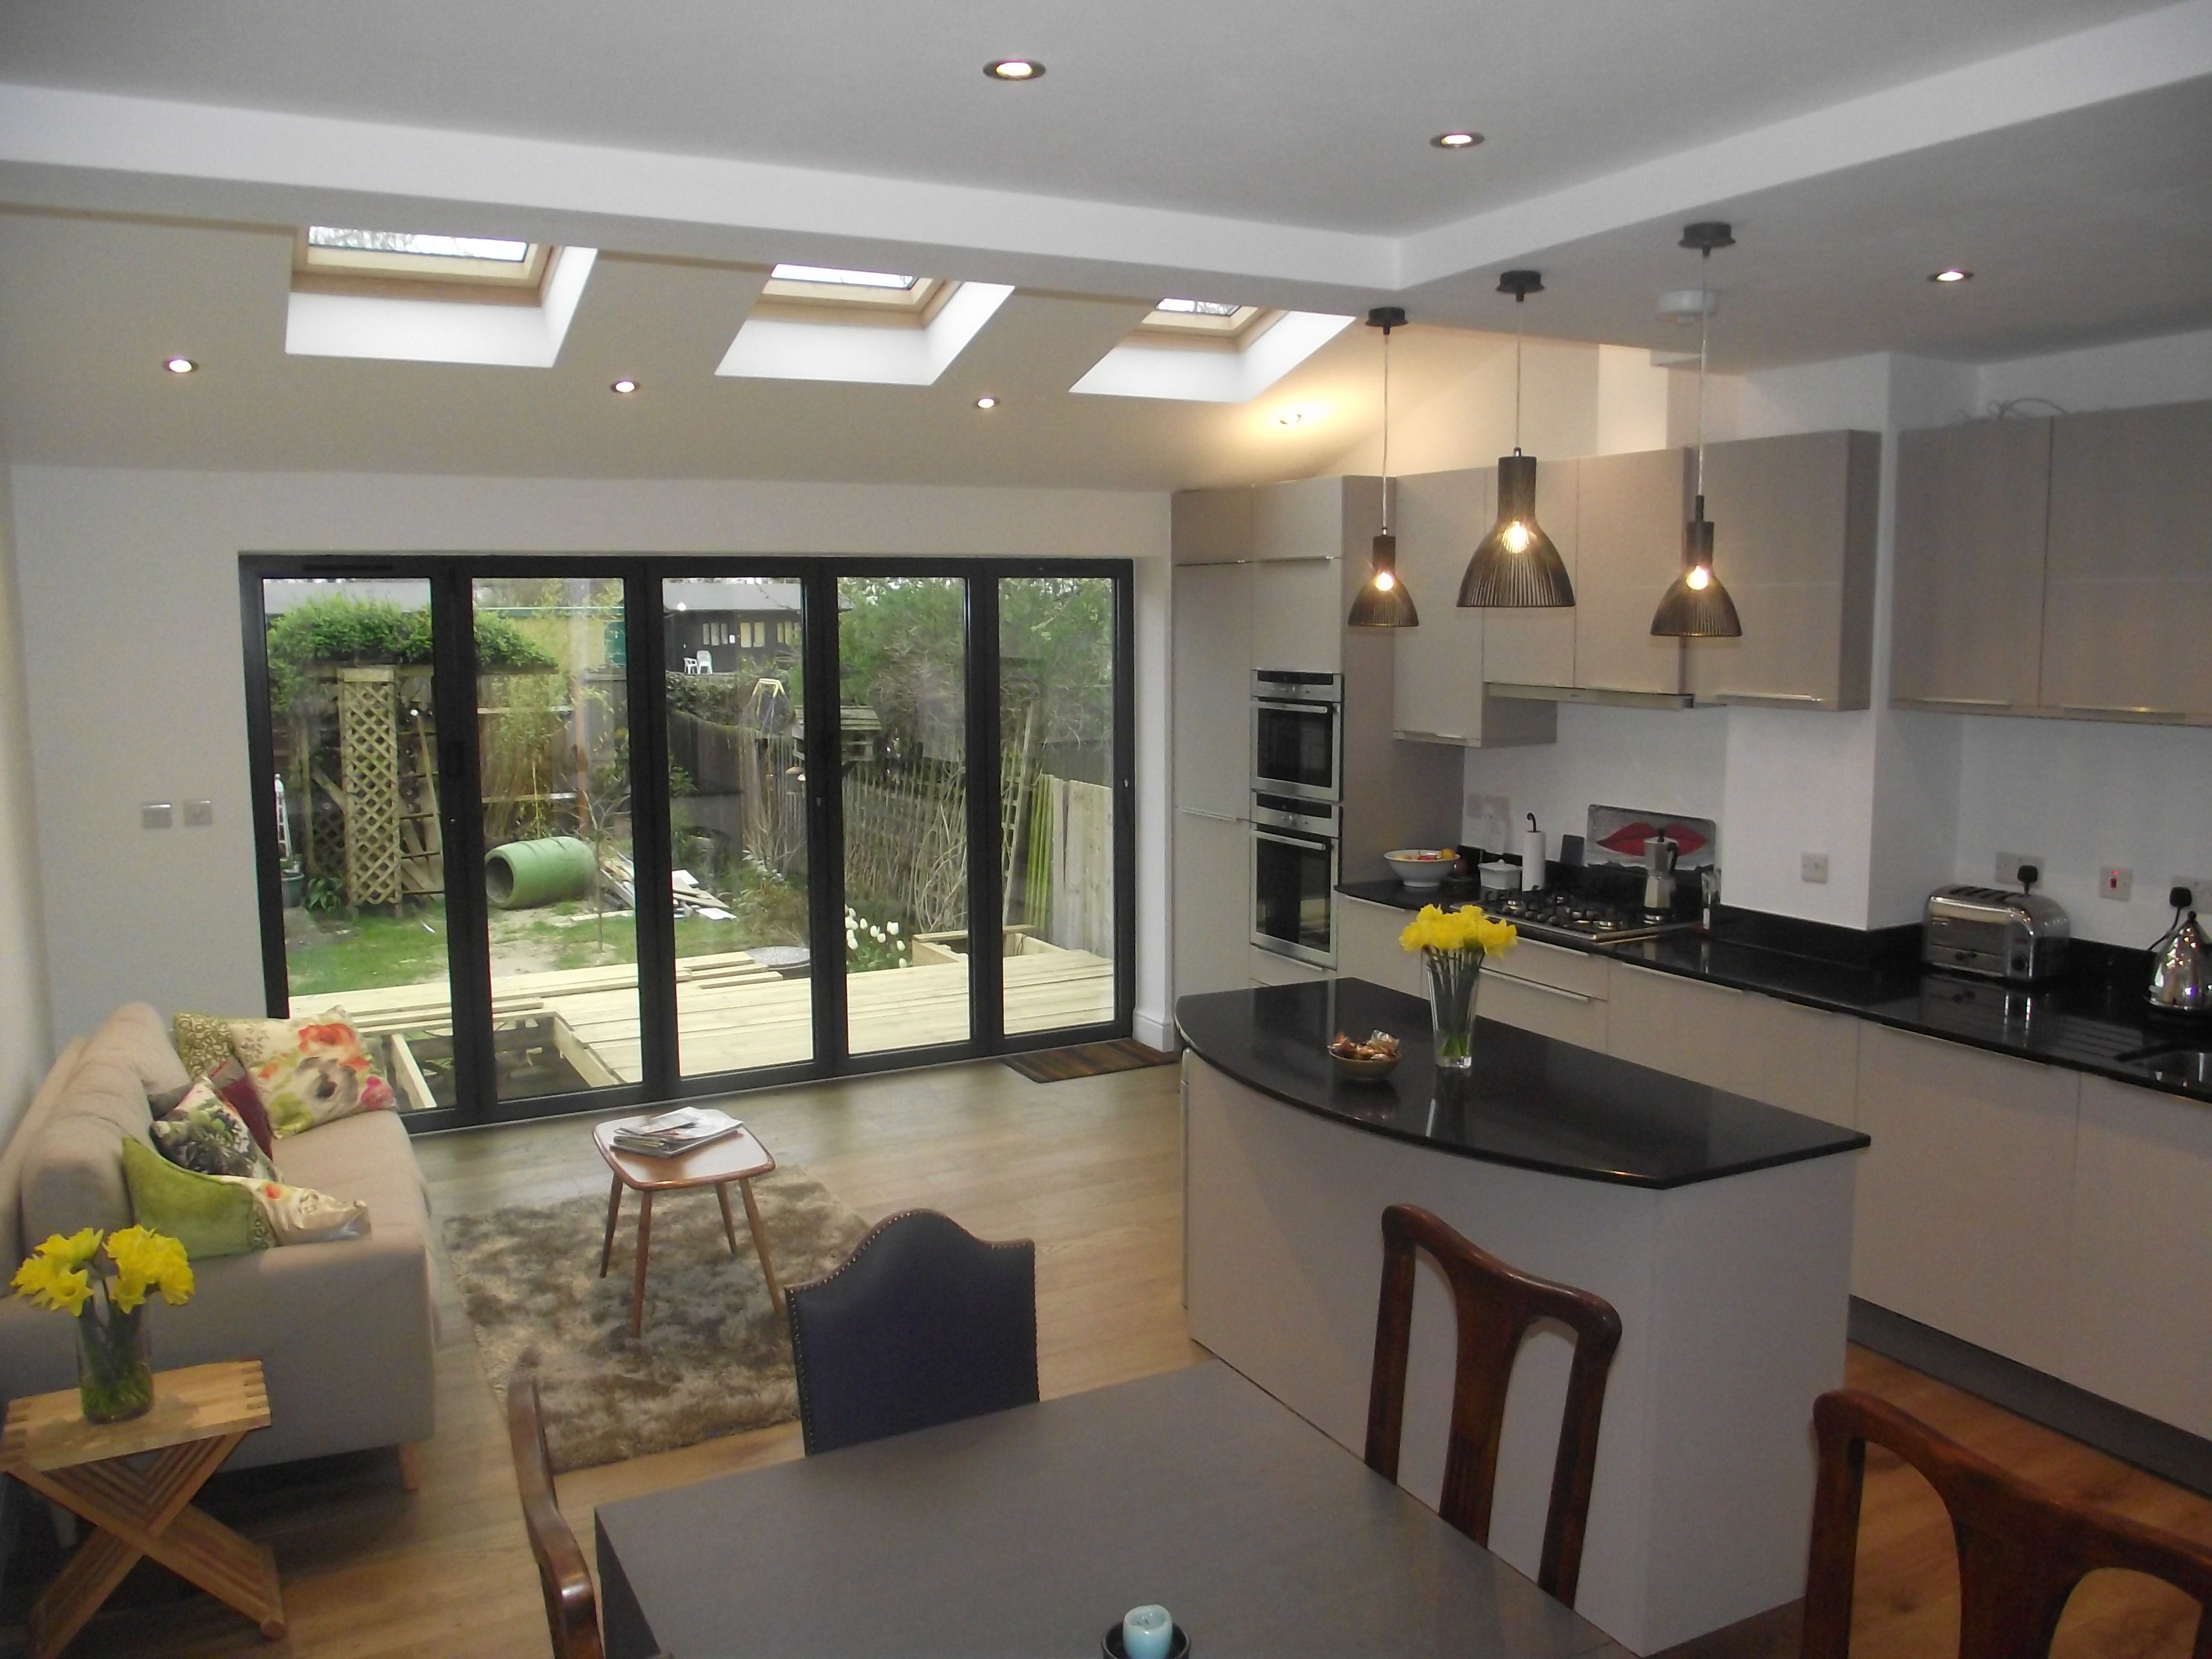 23 Ideas For A Super Cool Backyard Open Plan Kitchen Living Room